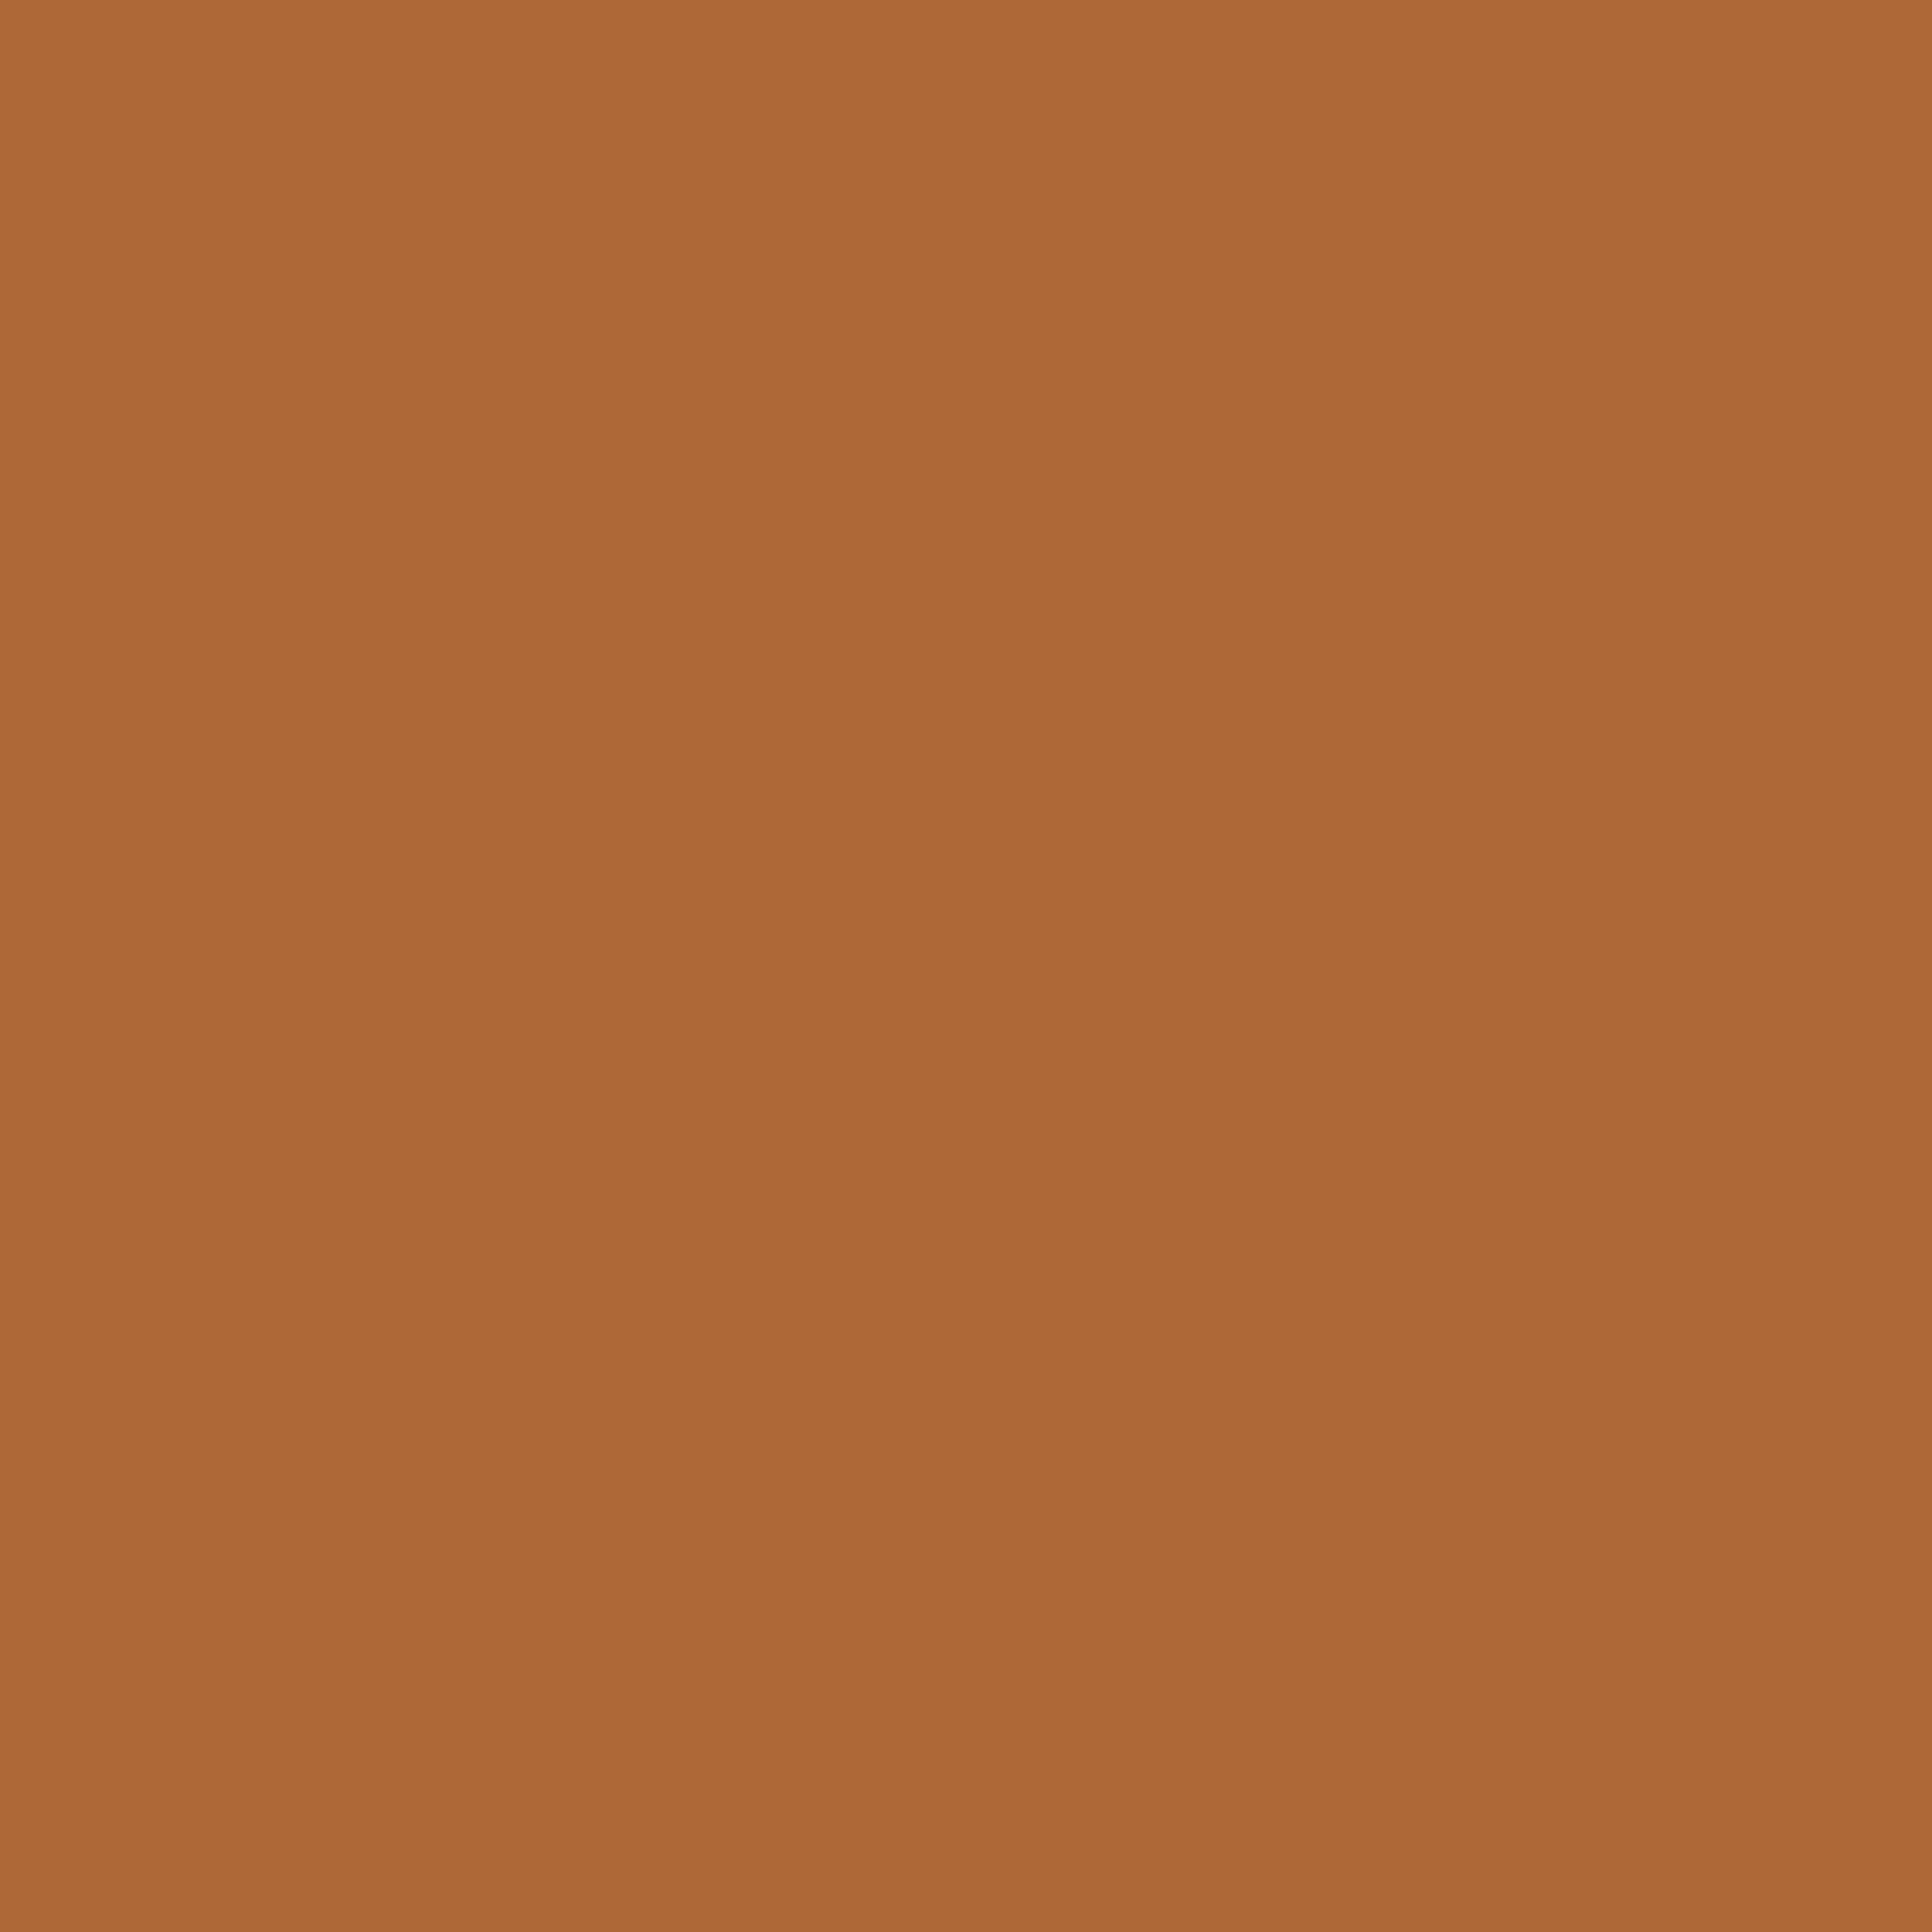 2732x2732 Windsor Tan Solid Color Background